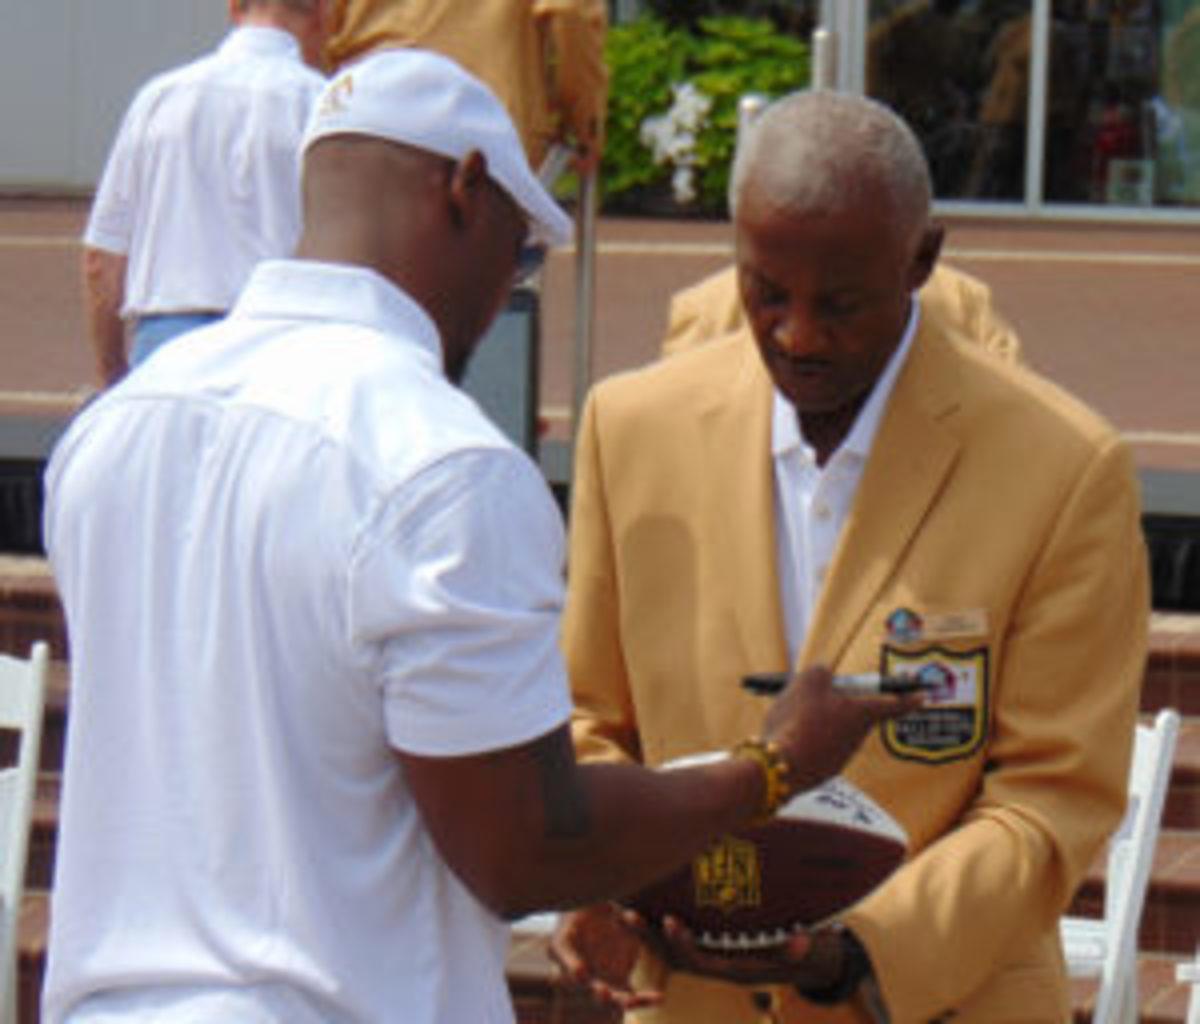 Brian Dawkins (left) signs a football for Hall of Famer Paul Warfield after the reunion photo. (Robert Kunz photo)